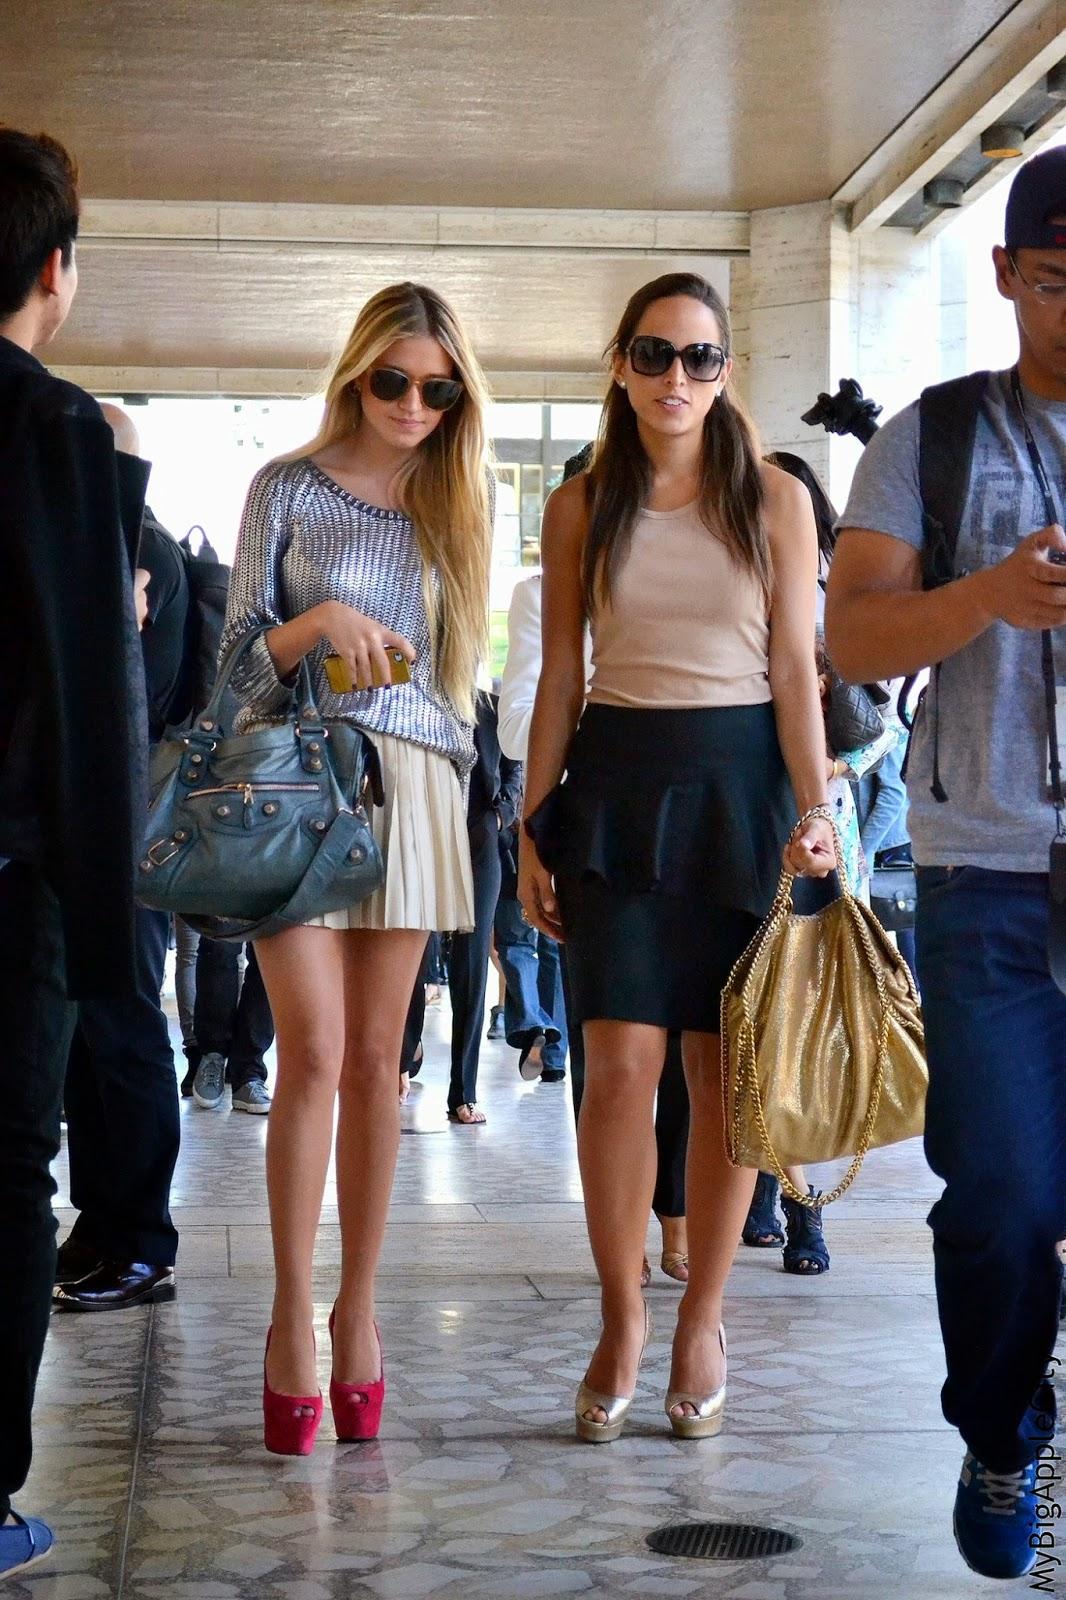 street-style-nyc-fashionblogger